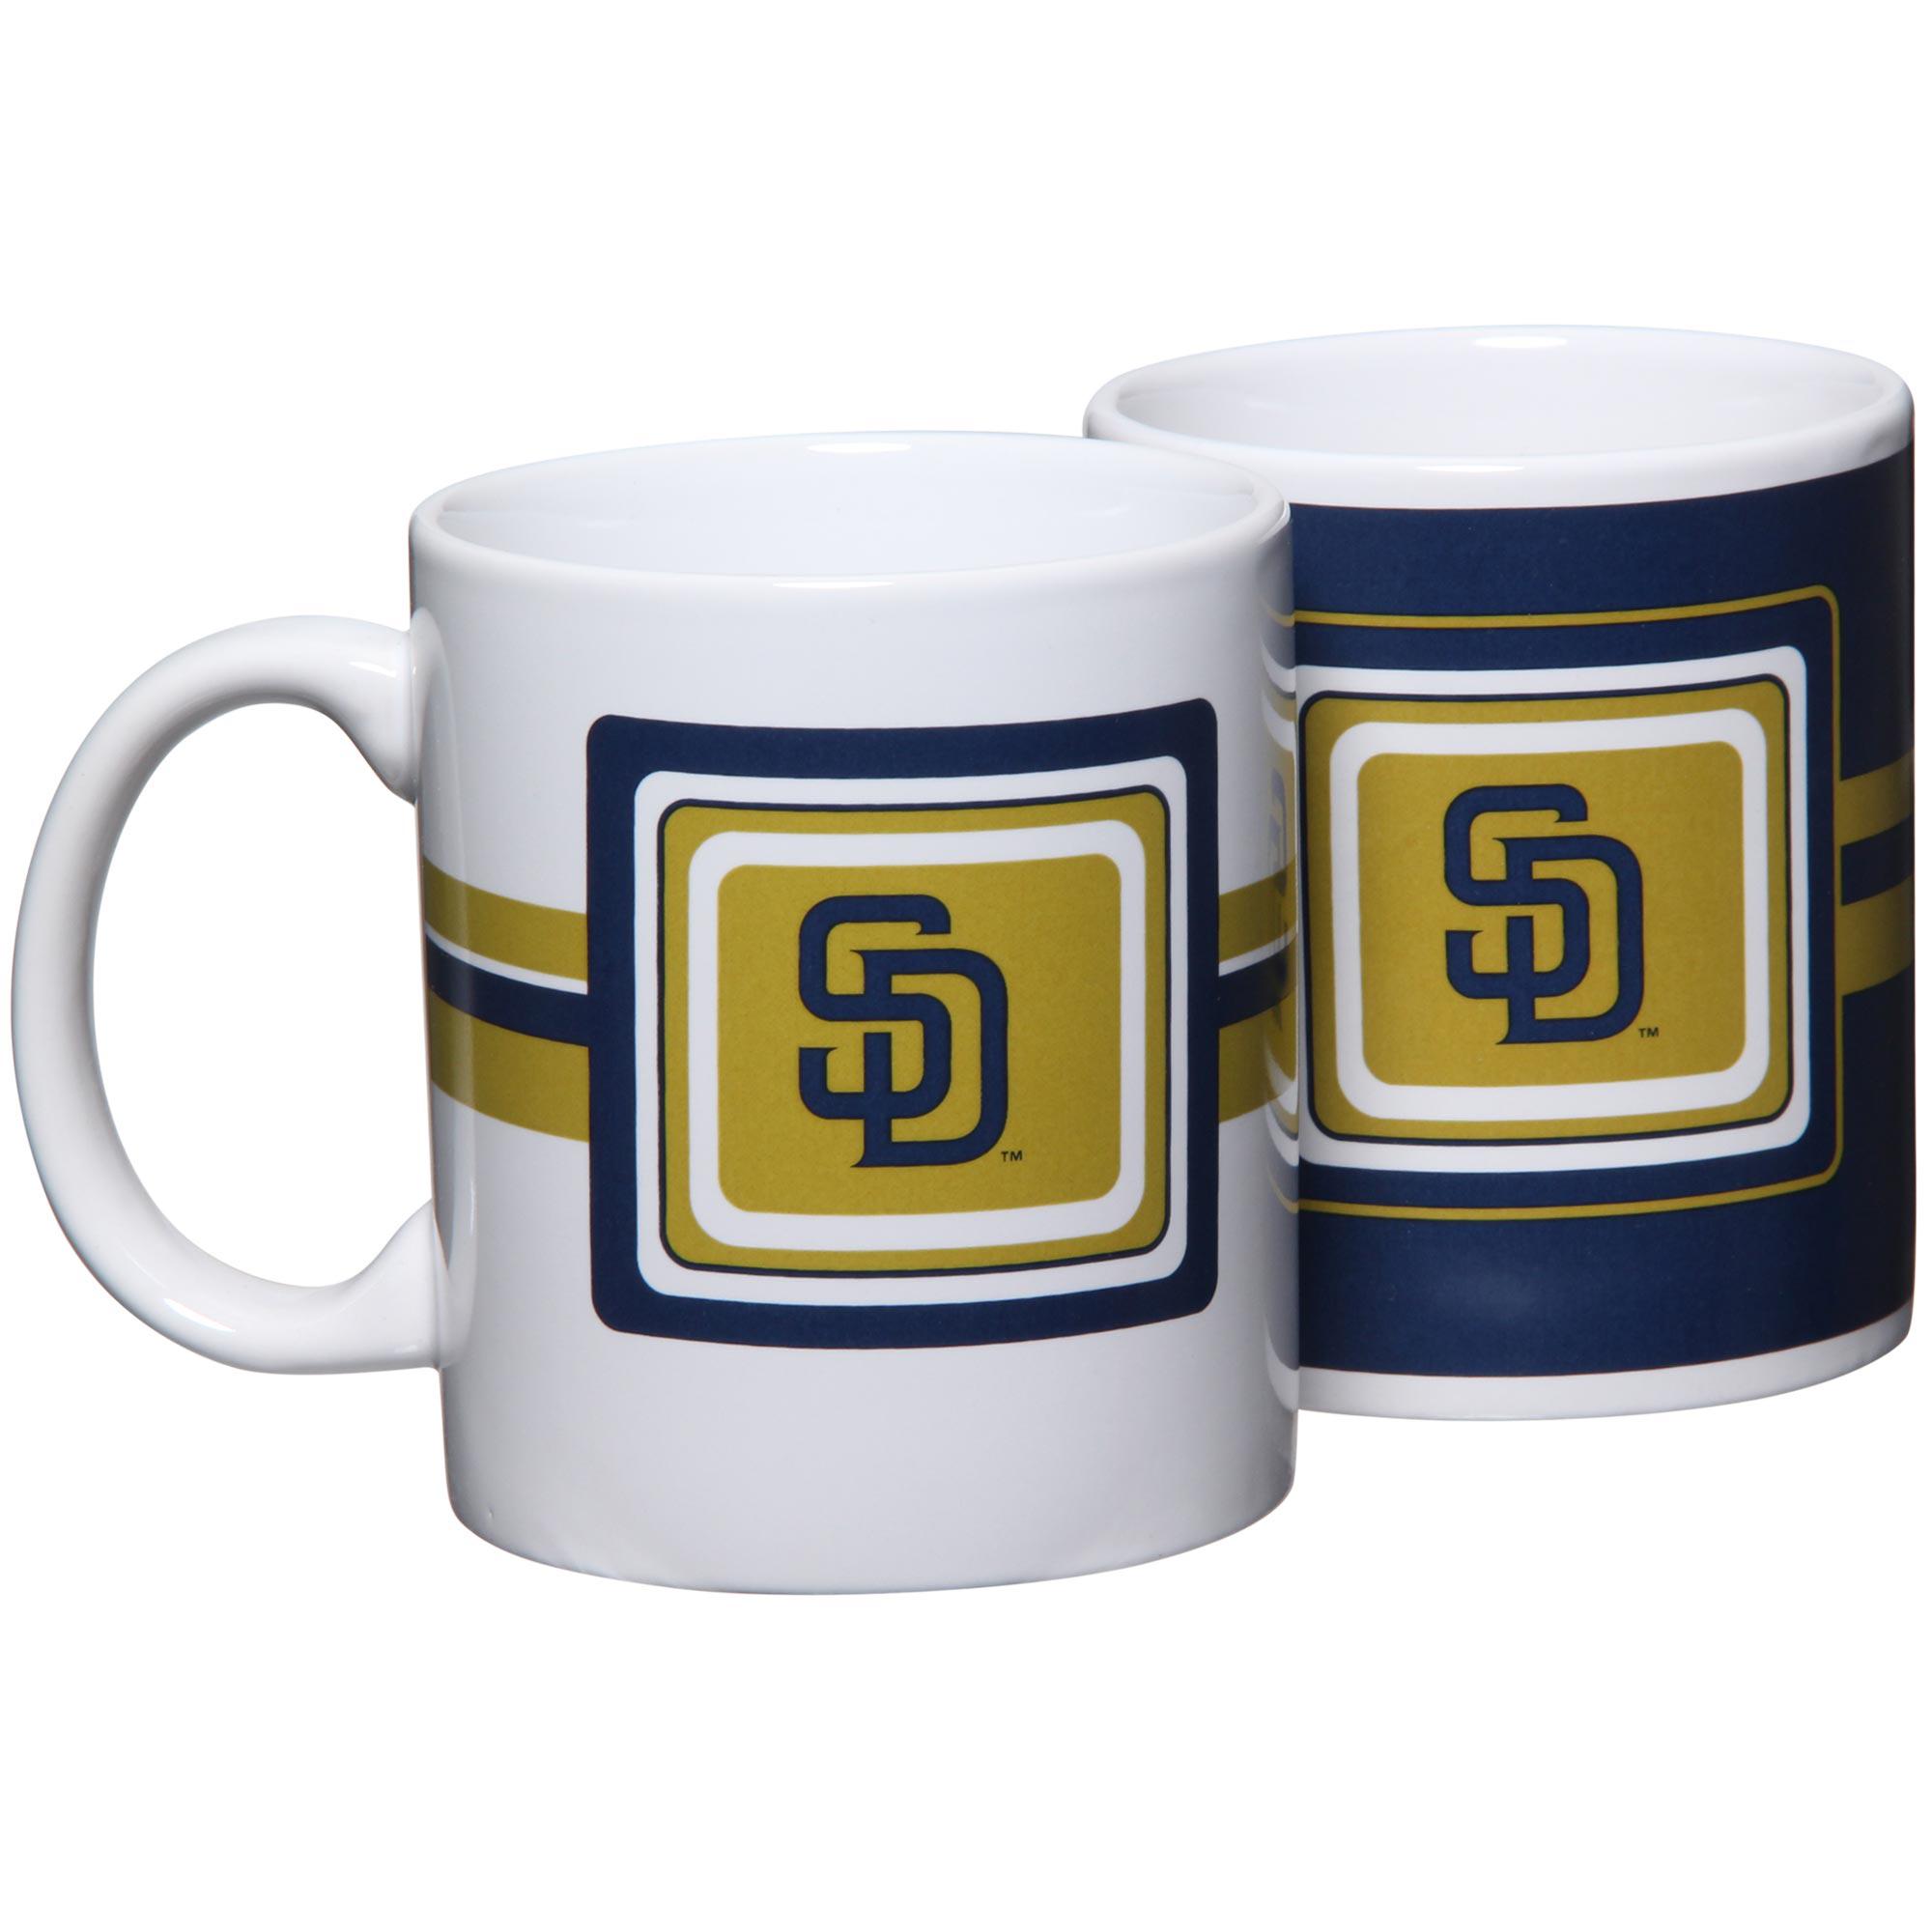 San Diego Padres 11oz. Two-Pack Mug Set - No Size